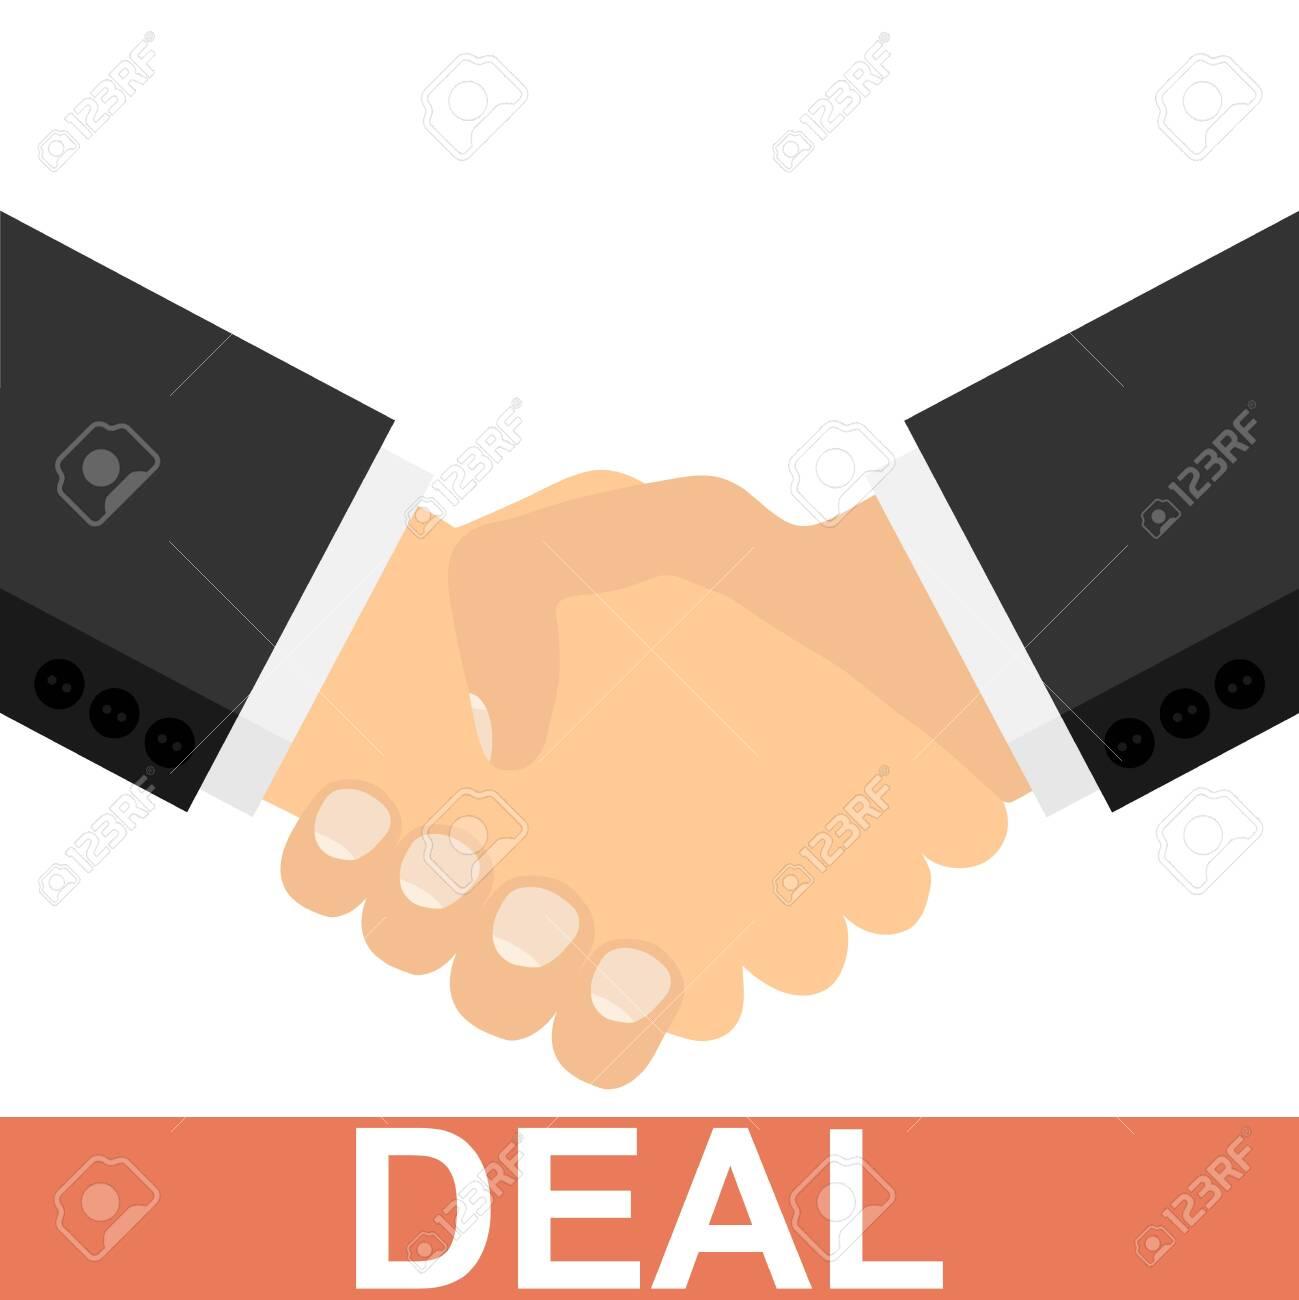 Deal. Successful deal. Two businessmen shake hands. Handshake. Vector illustration Vector - 150176323